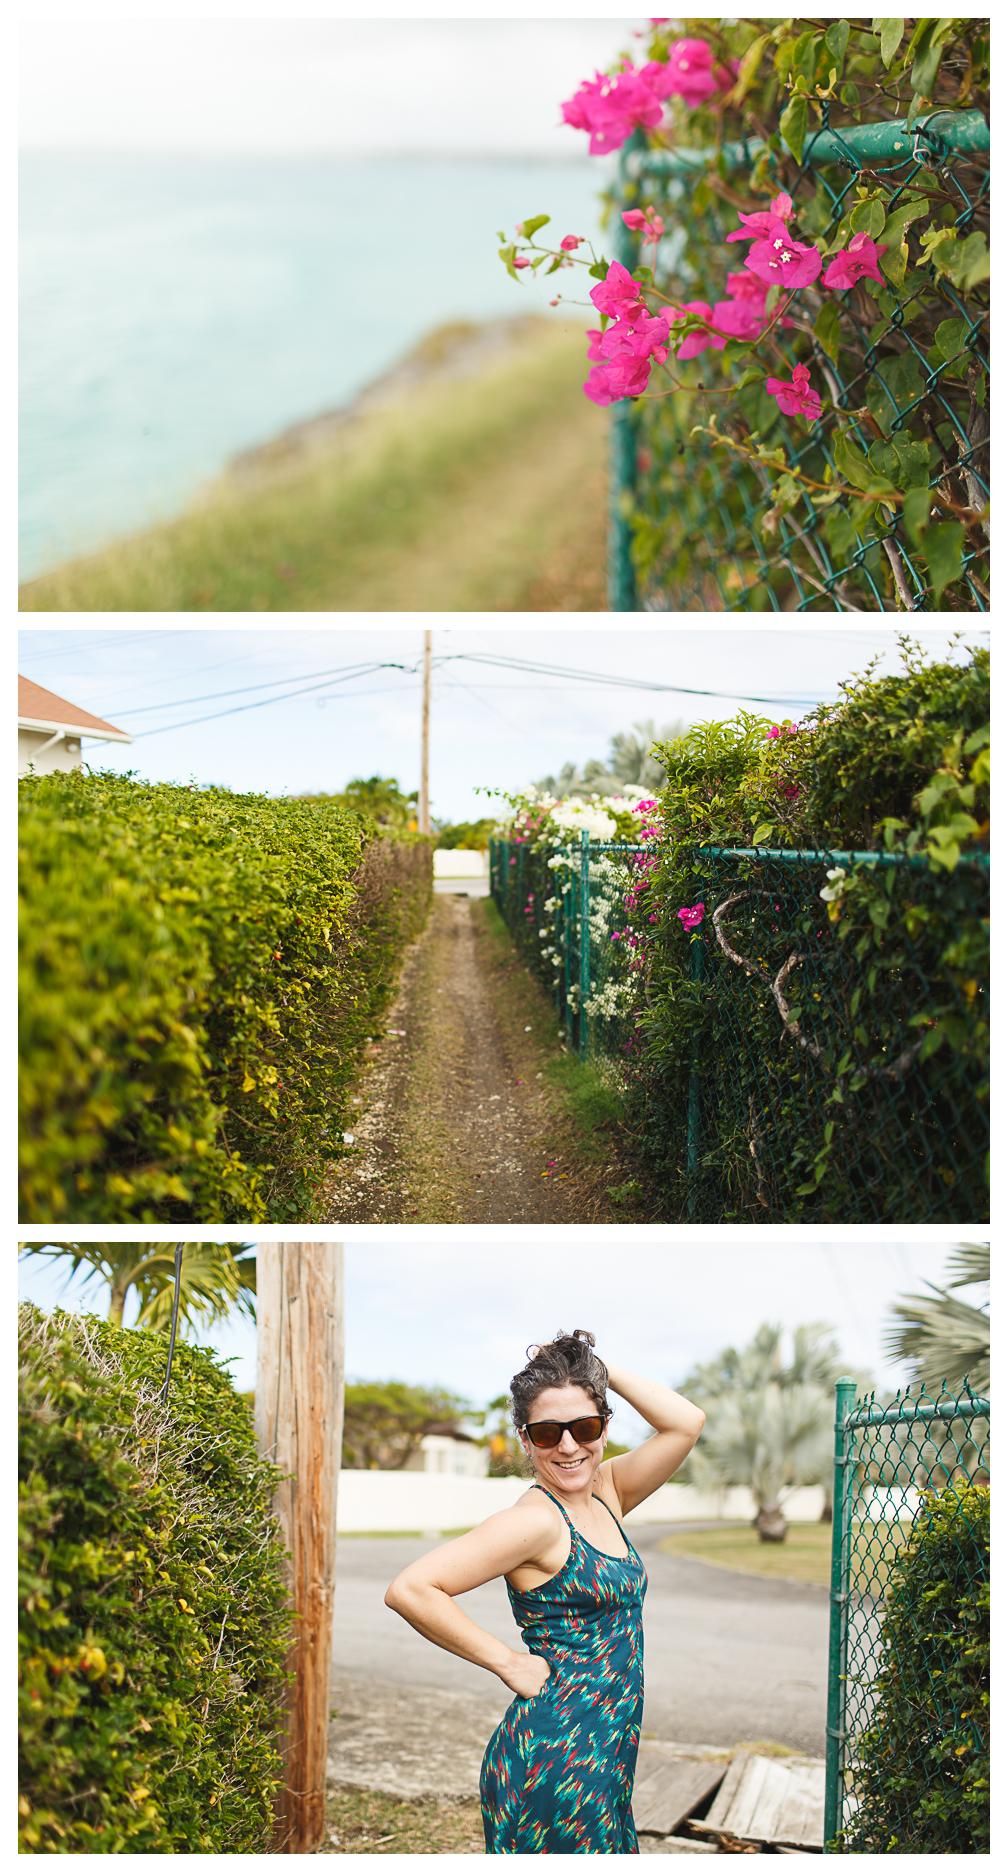 Barbados blog 1-8.jpg